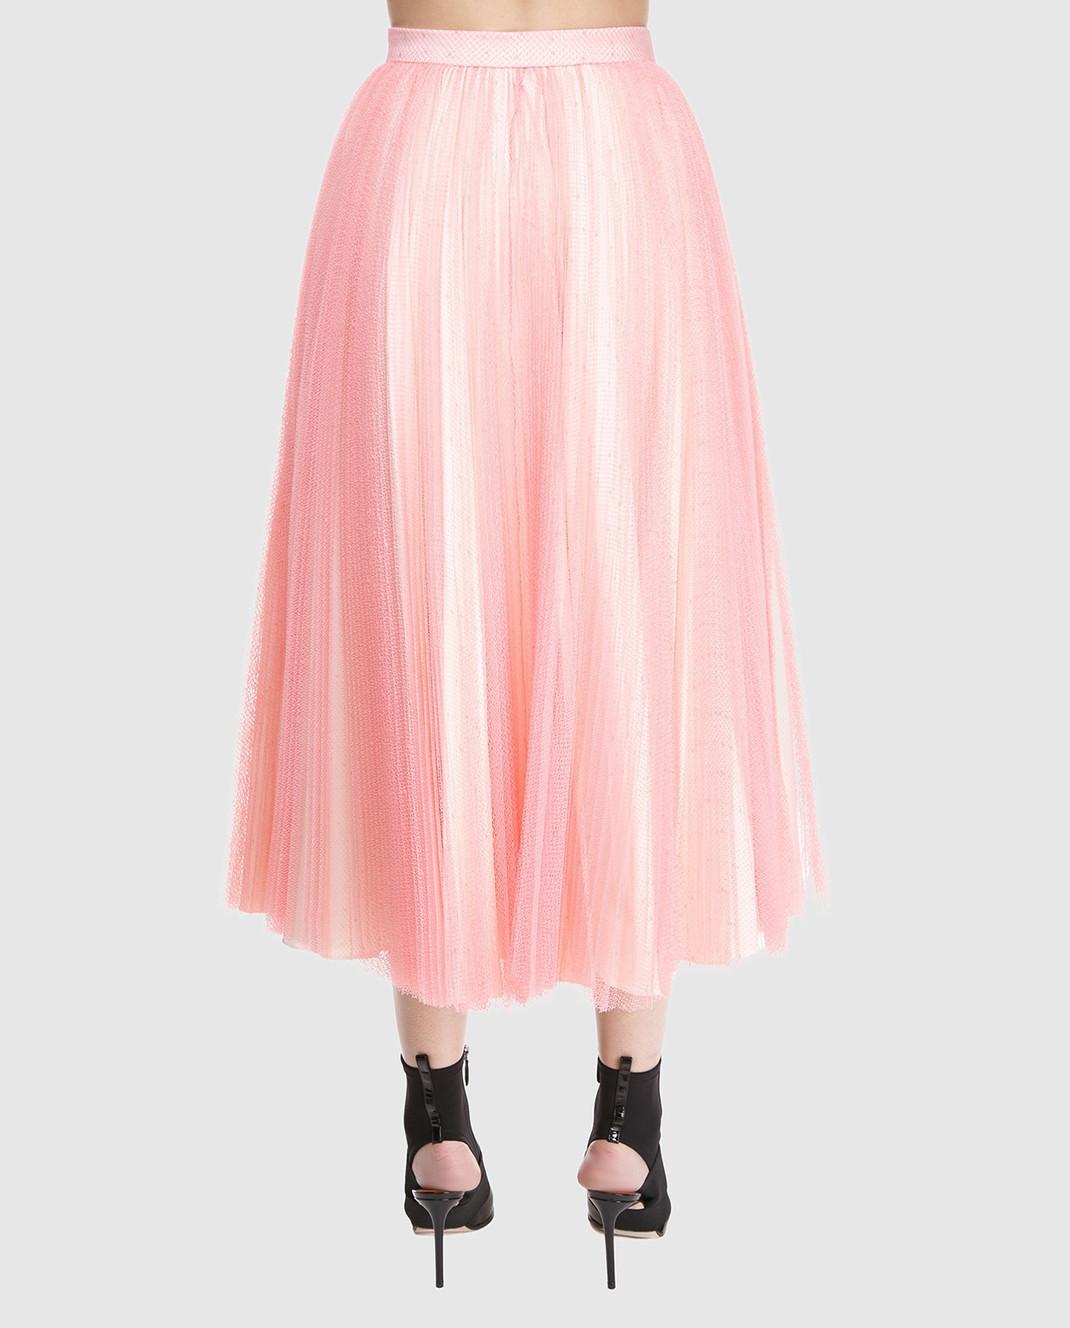 Philosophy di Lorenzo Serafini Розовая юбка V0126 изображение 4